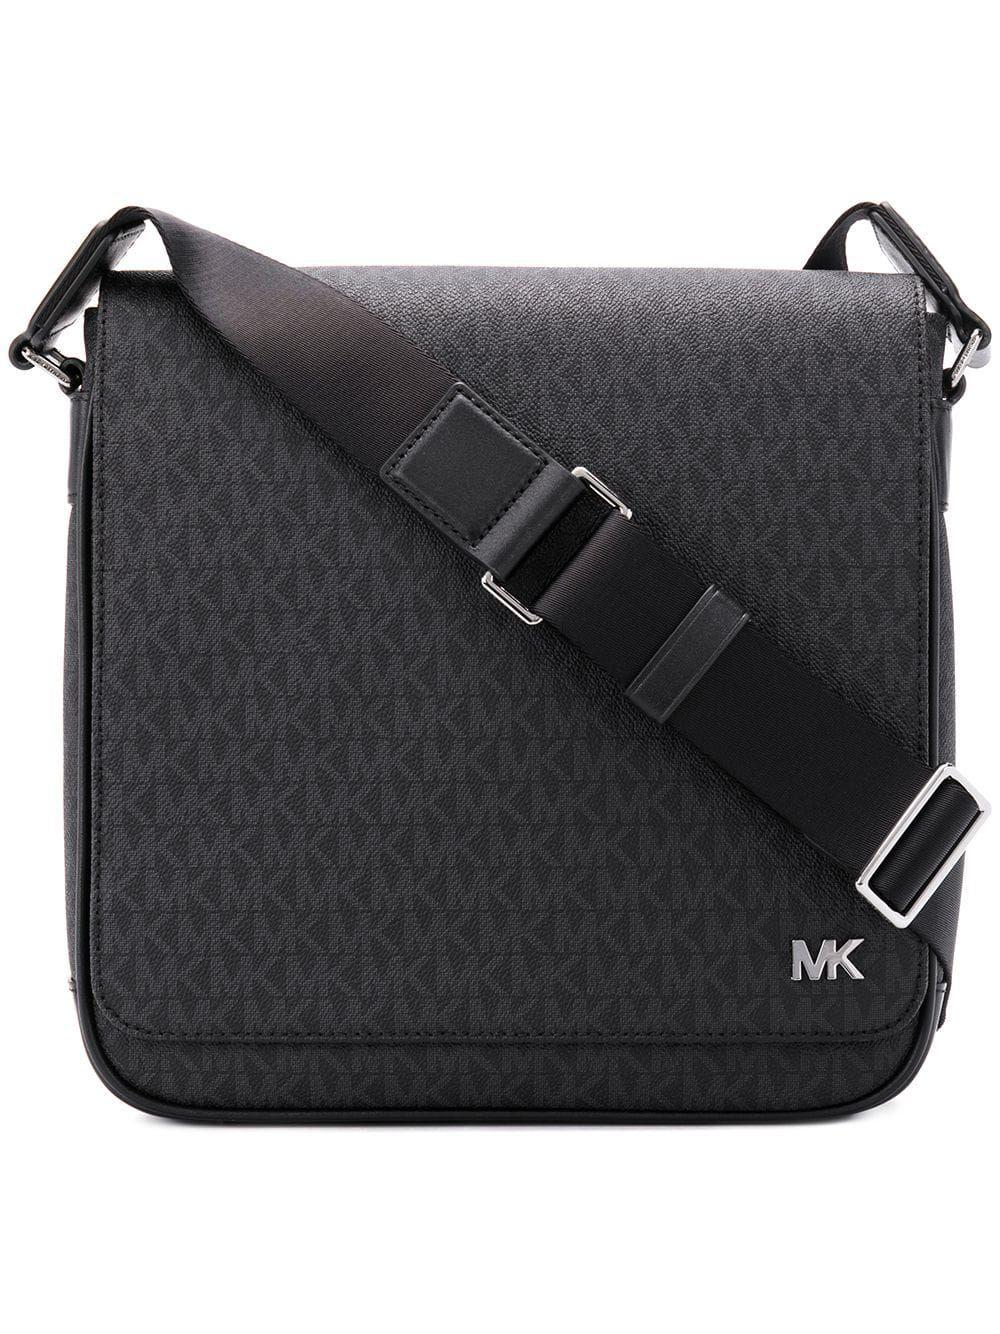 e1e61e7baa3b8 MICHAEL MICHAEL KORS MICHAEL MICHAEL KORS MONOGRAM PRINT MESSENGER BAG -  BLACK.  michaelmichaelkors  bags  shoulder bags